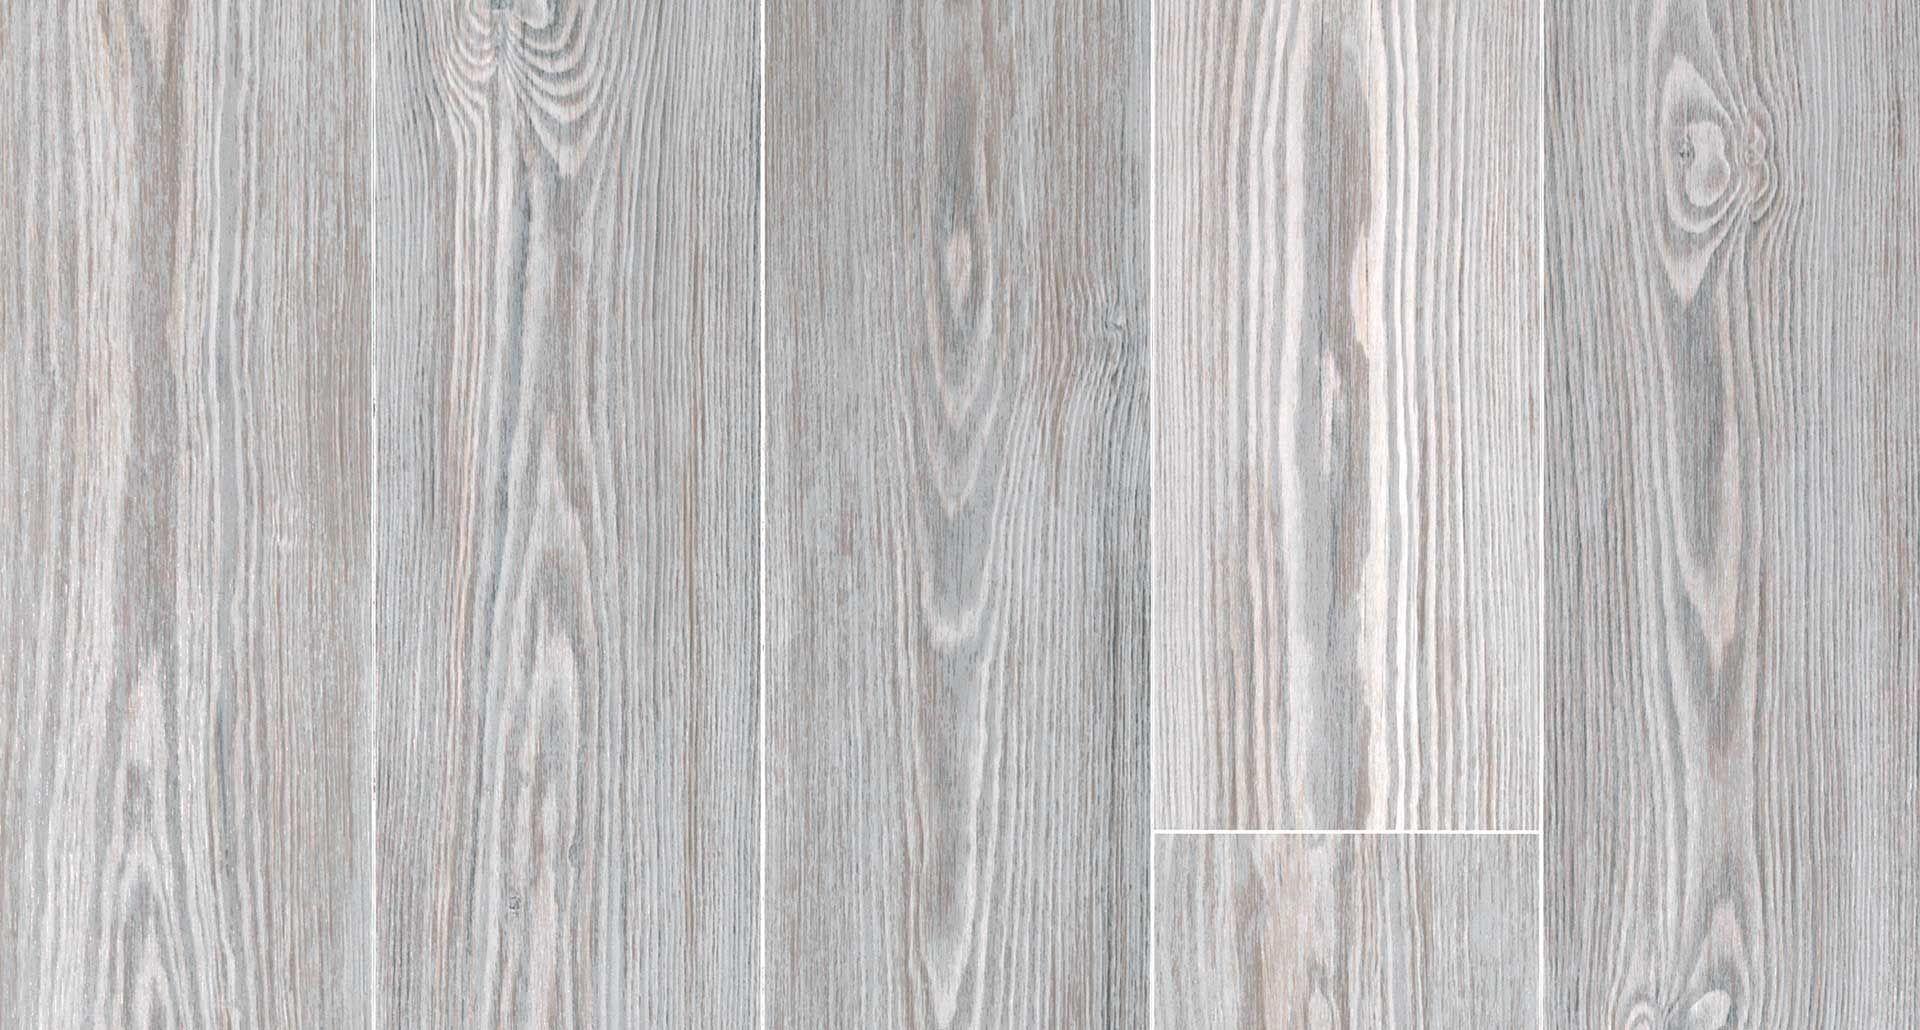 Willow Lake Pine Textured Laminate Floor Light Wood